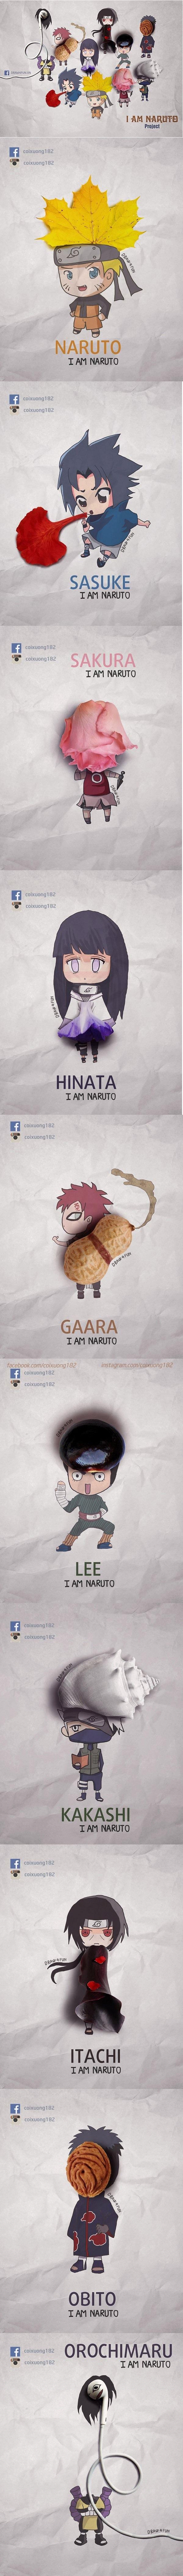 Naruto's characters